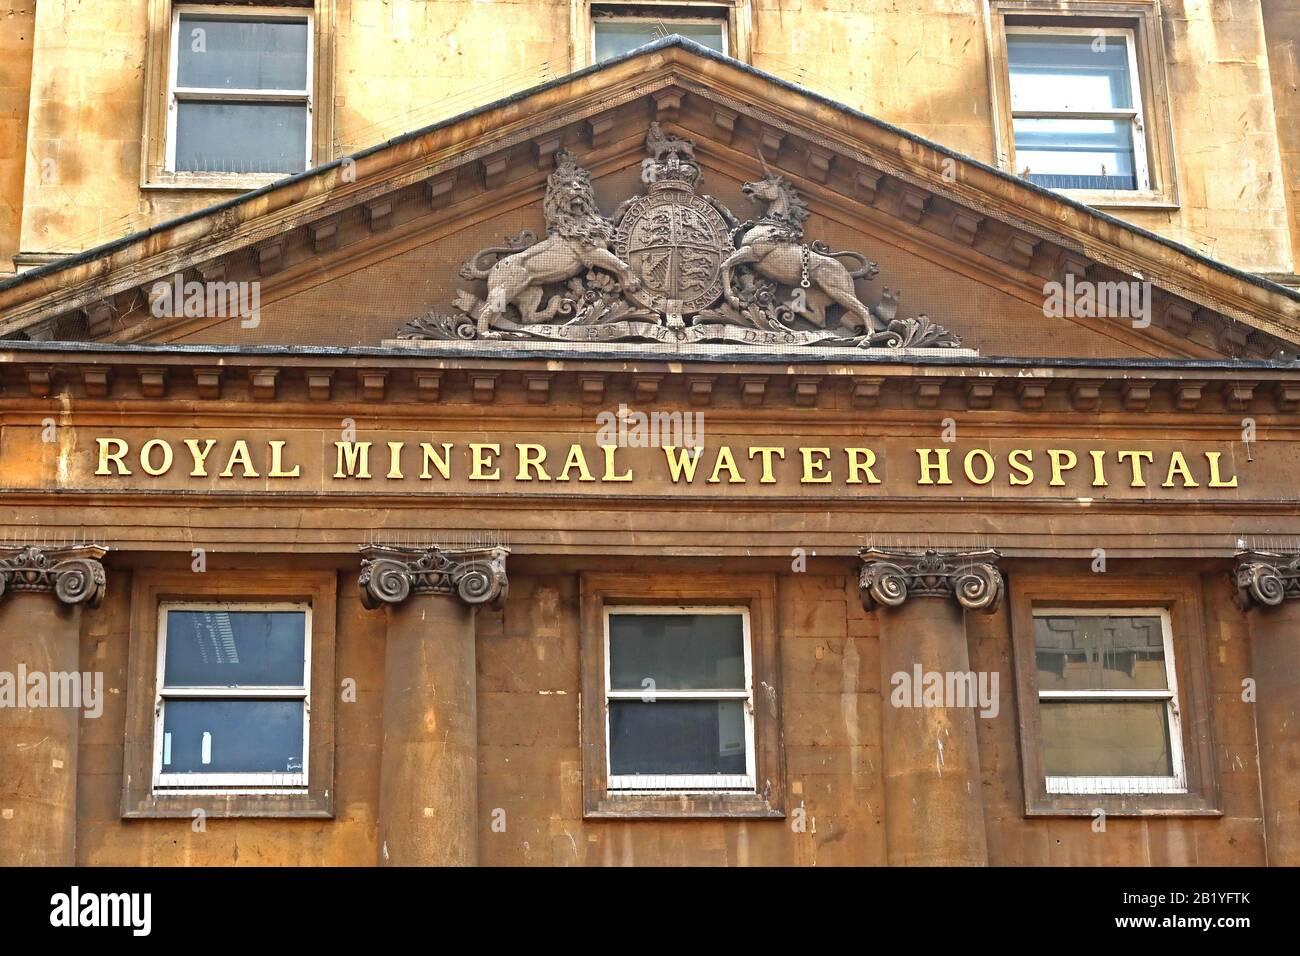 Dieses Stockfoto: Royal Mineral Water Hospital, Krankenhaus ursprünglich für Arme, lokal bekannt als The Min, Gascoyne House Upper Borough Walls, Bath, Somerset, BA1 - 2B1YFT